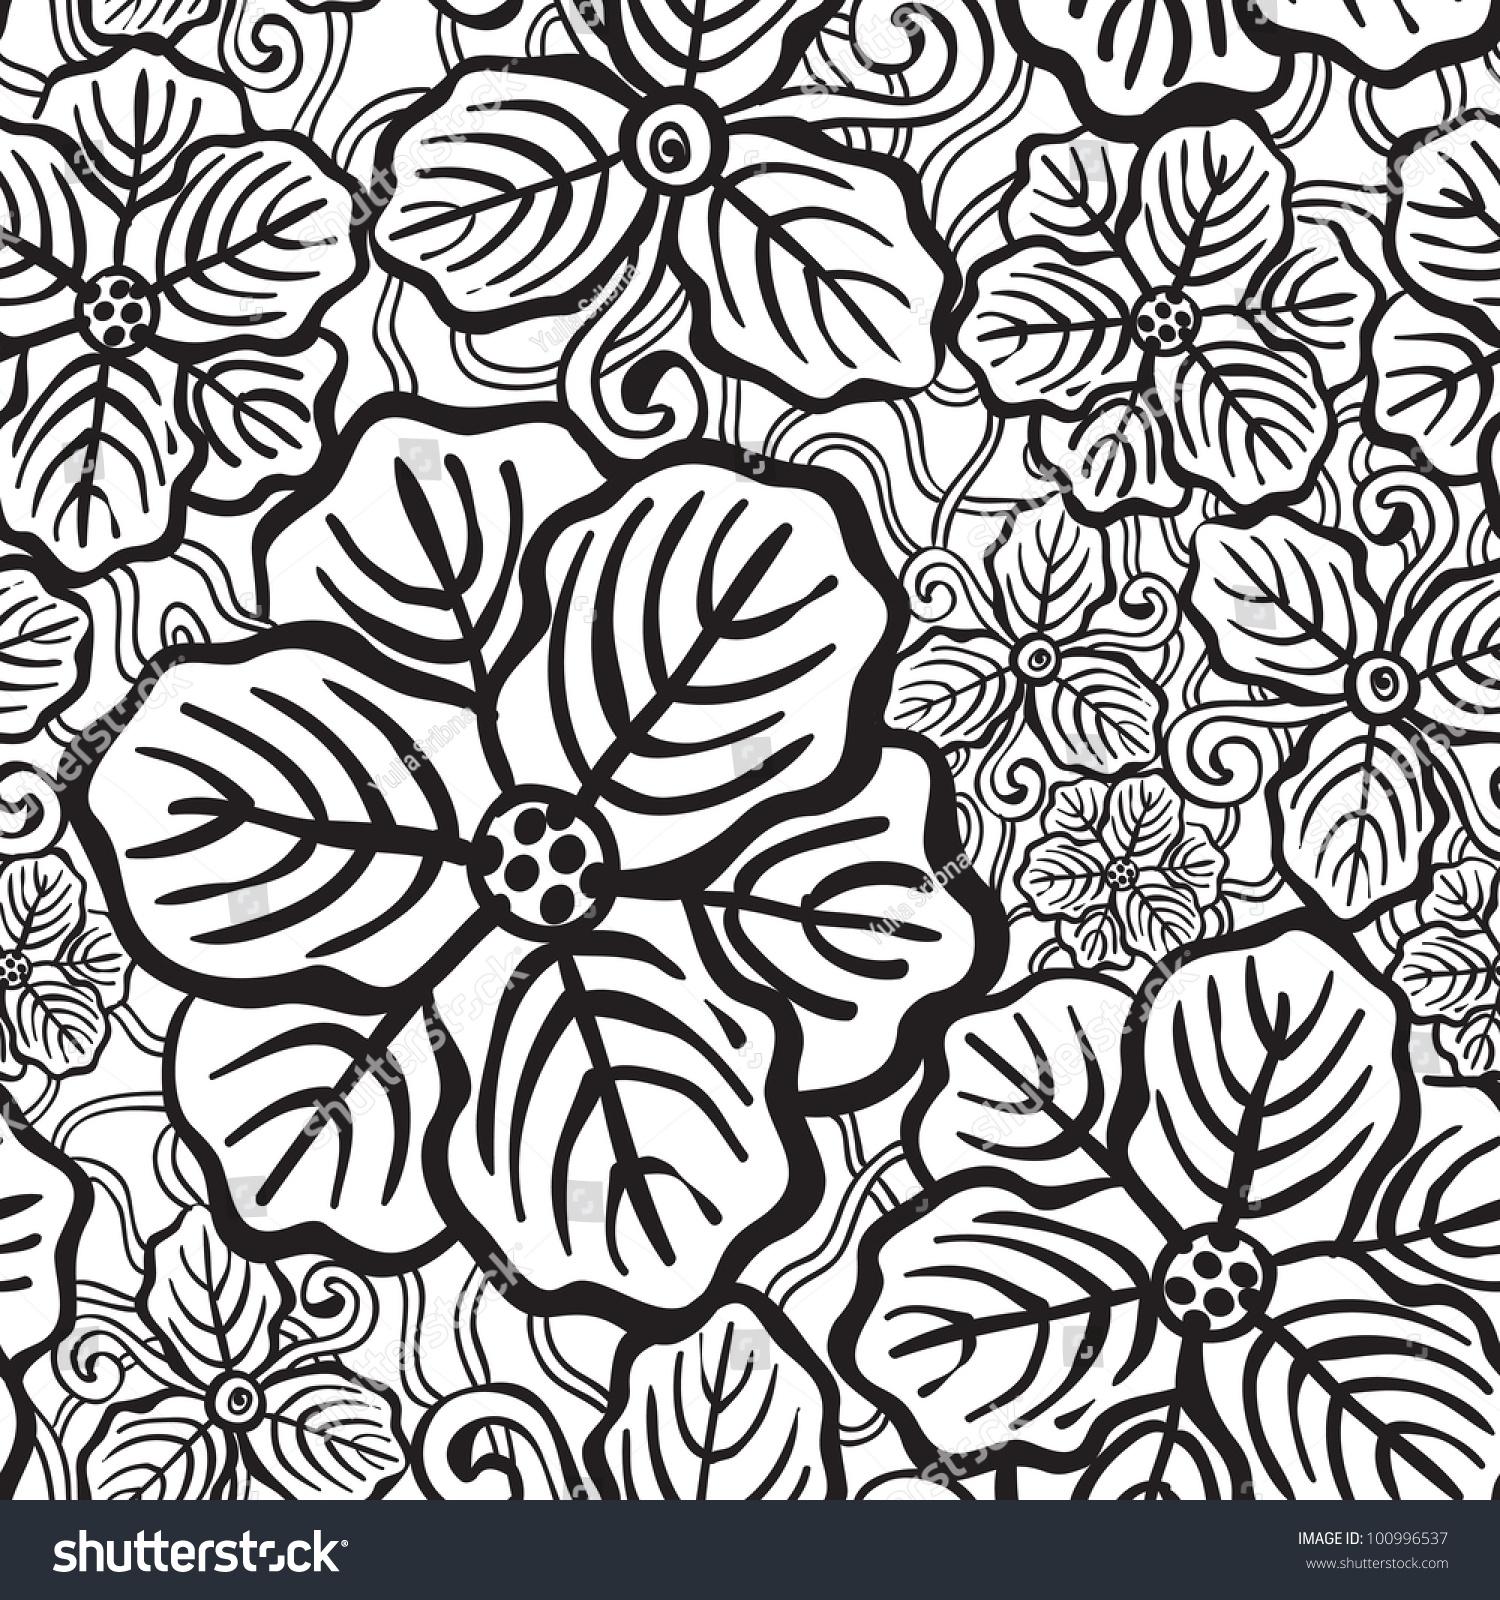 Hand drawn floral wallpaper black white stock vector 100996537 hand drawn floral wallpaper with black and white flowers mightylinksfo